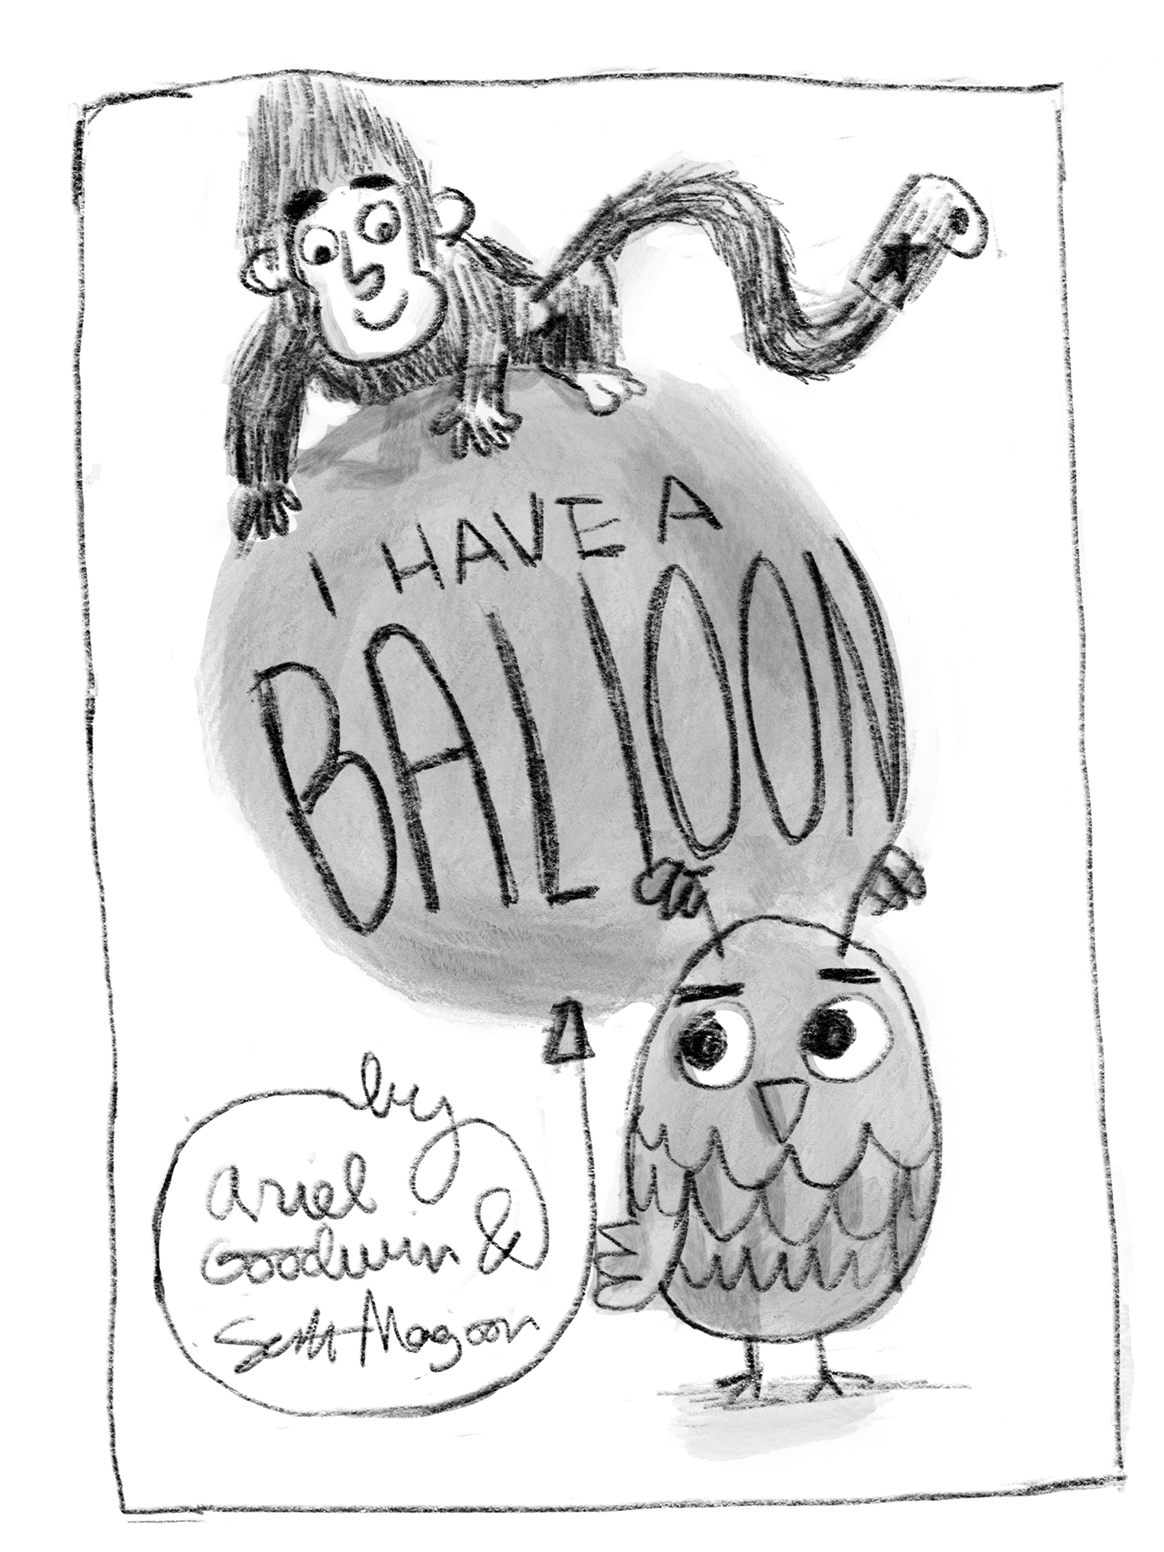 A cover sketch